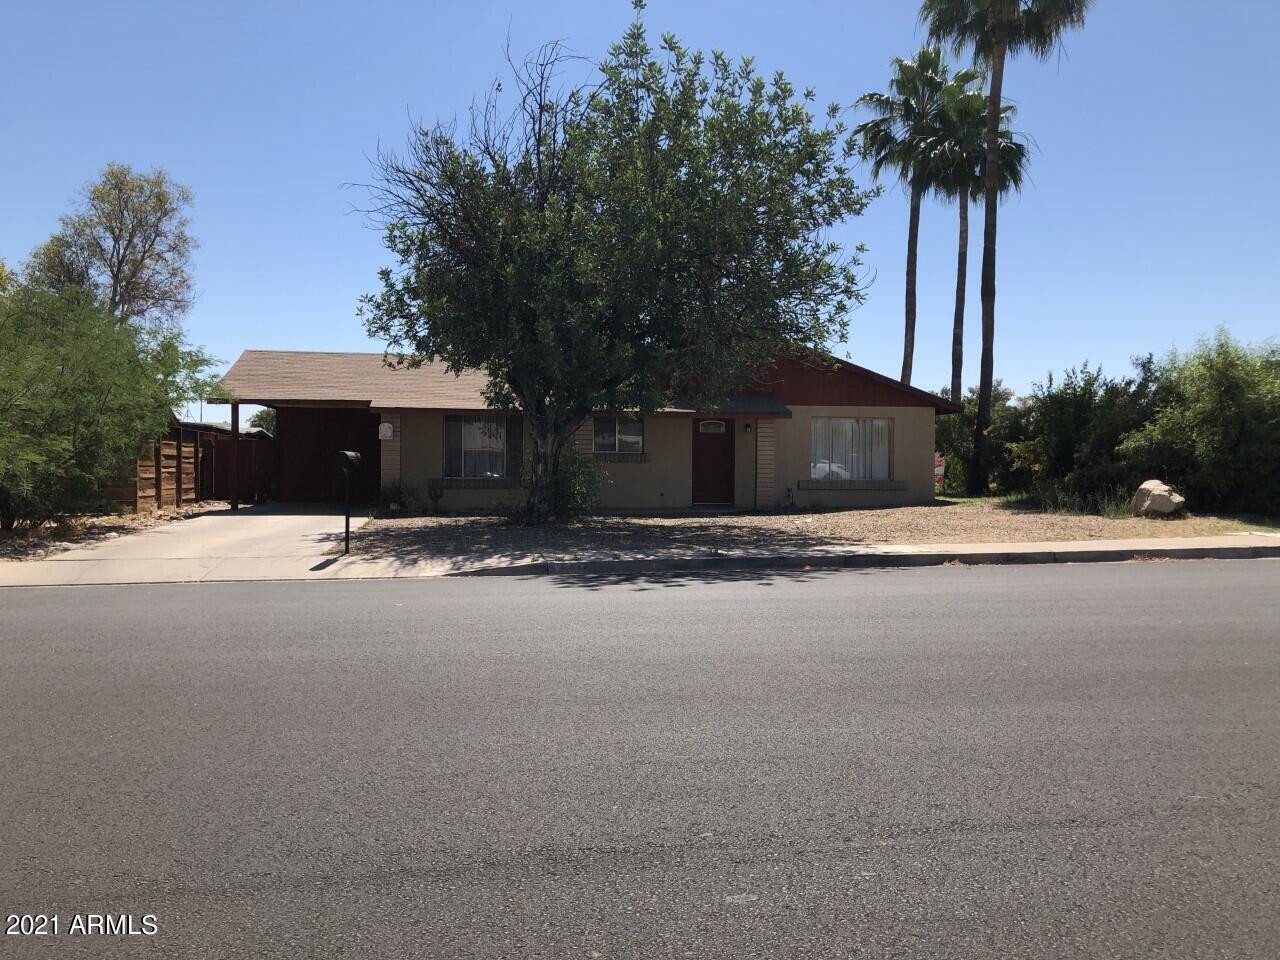 6337 S COLLEGE Avenue, Tempe, AZ 85283 - MLS#: 6243021